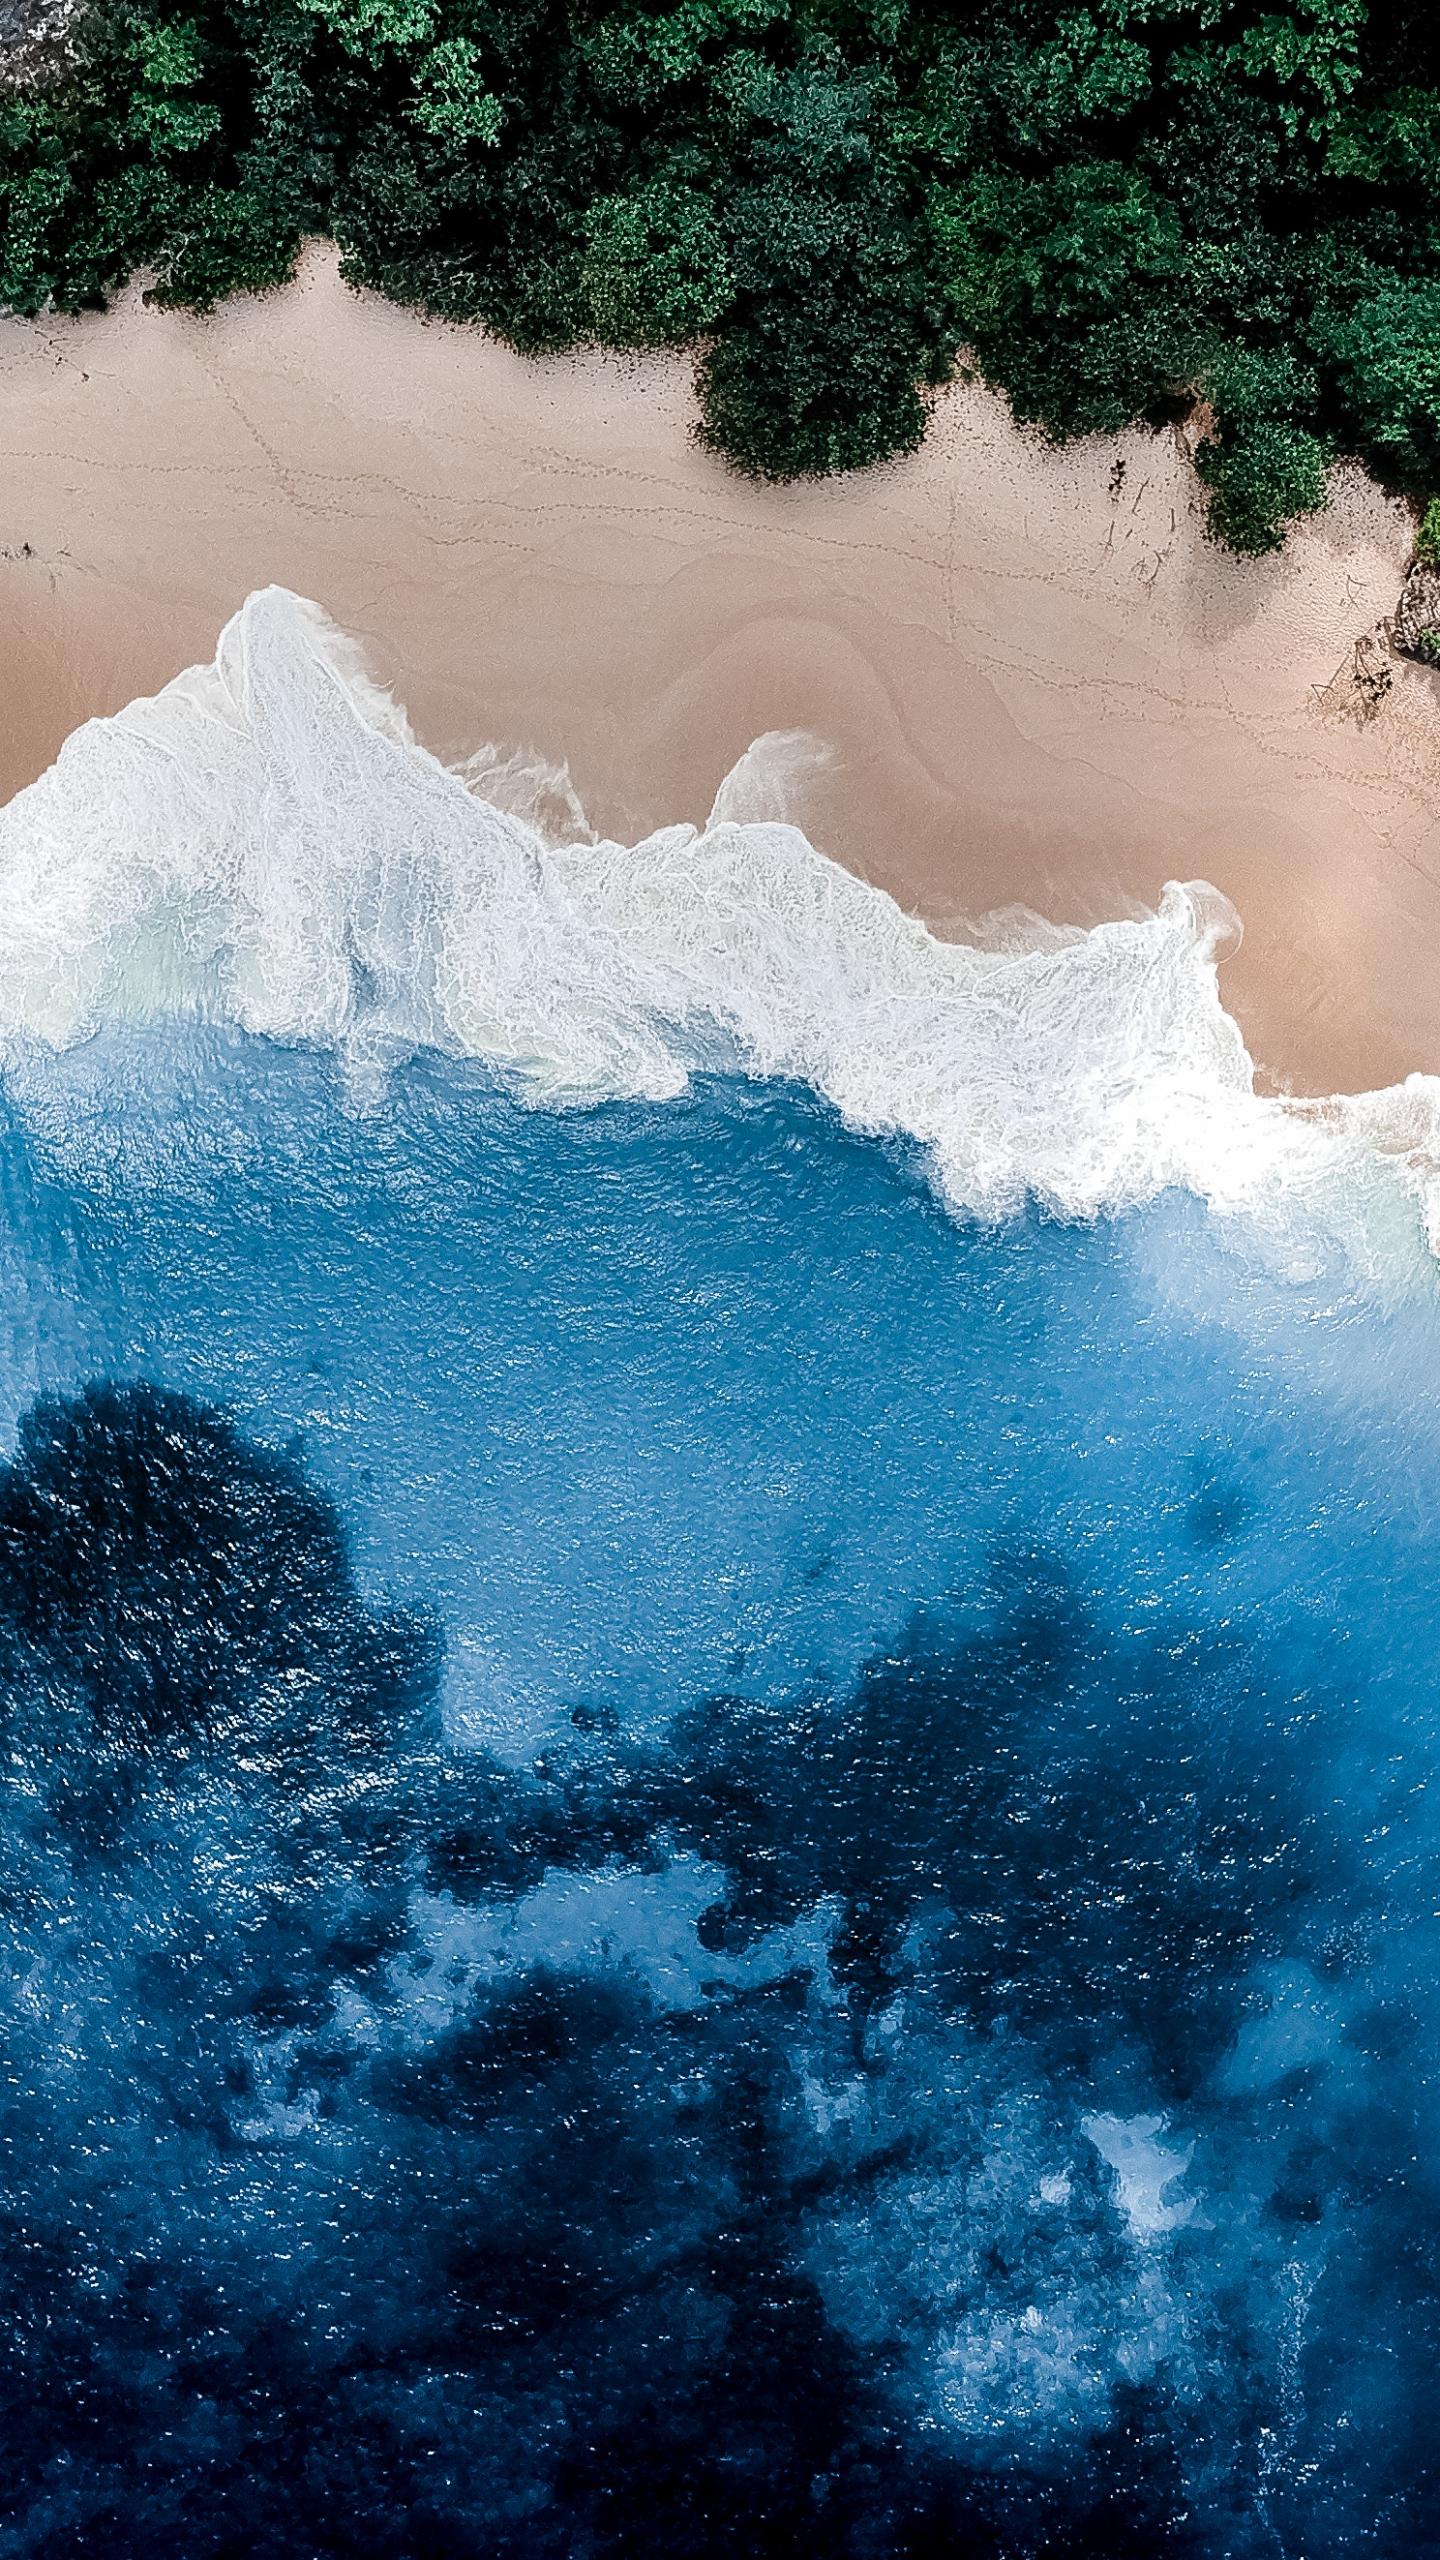 Download 1440x2560 wallpaper nature beach coast aerial - Nature wallpaper 4k phone ...